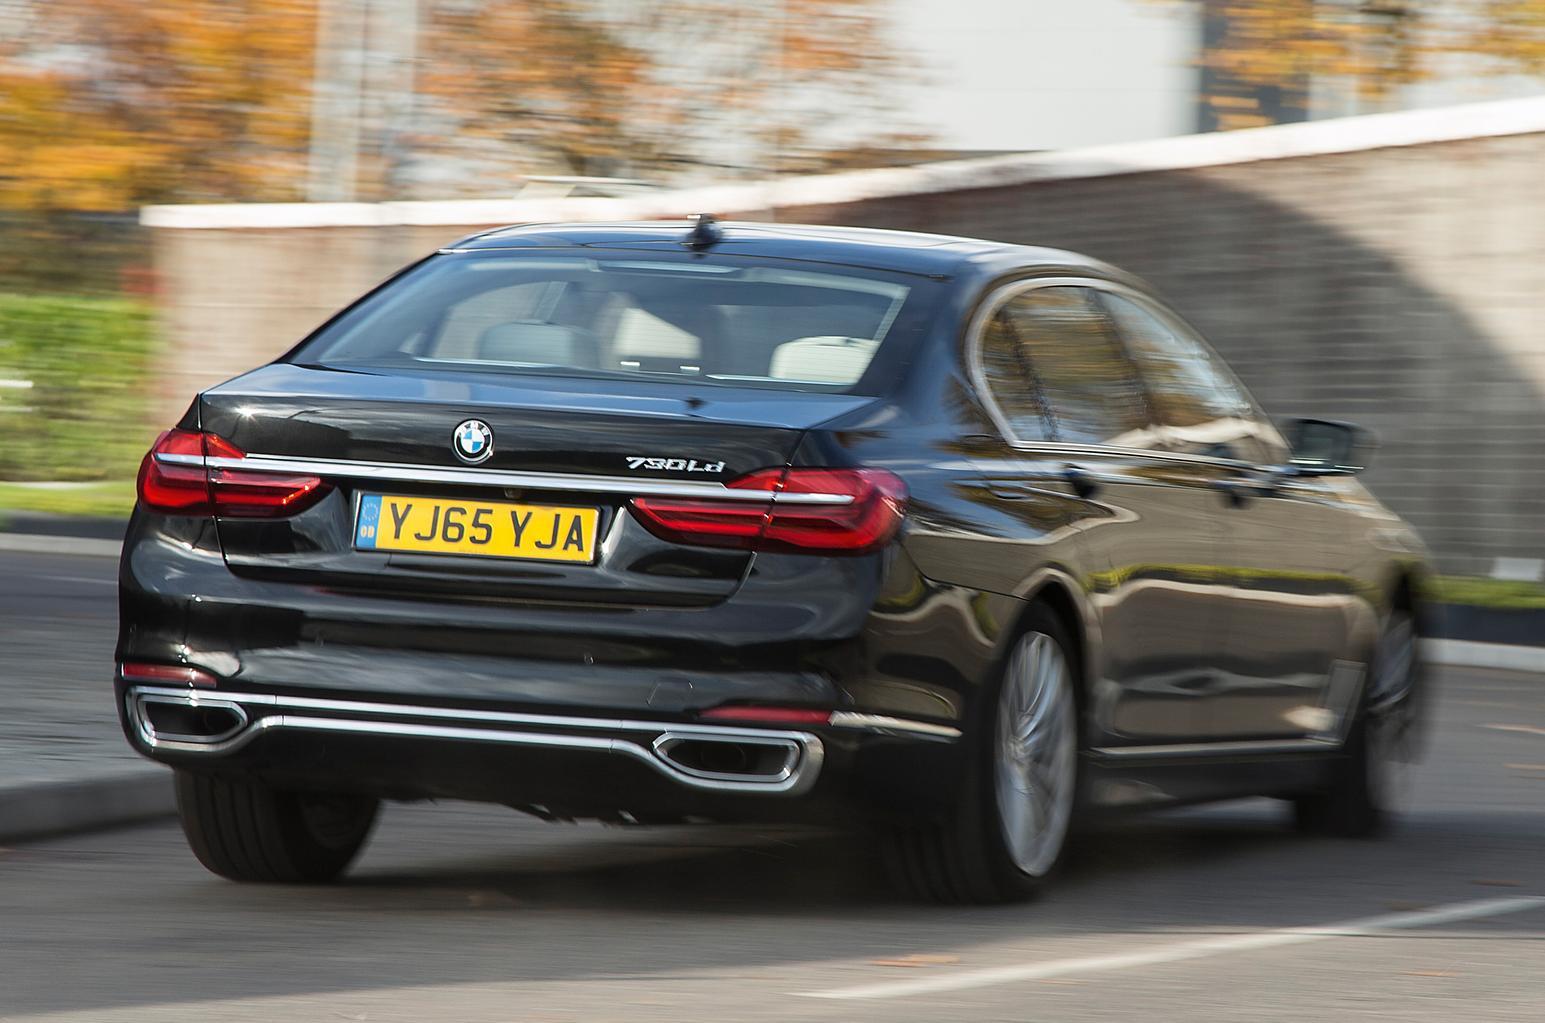 New BMW 7 Series vs Mercedes S-Class